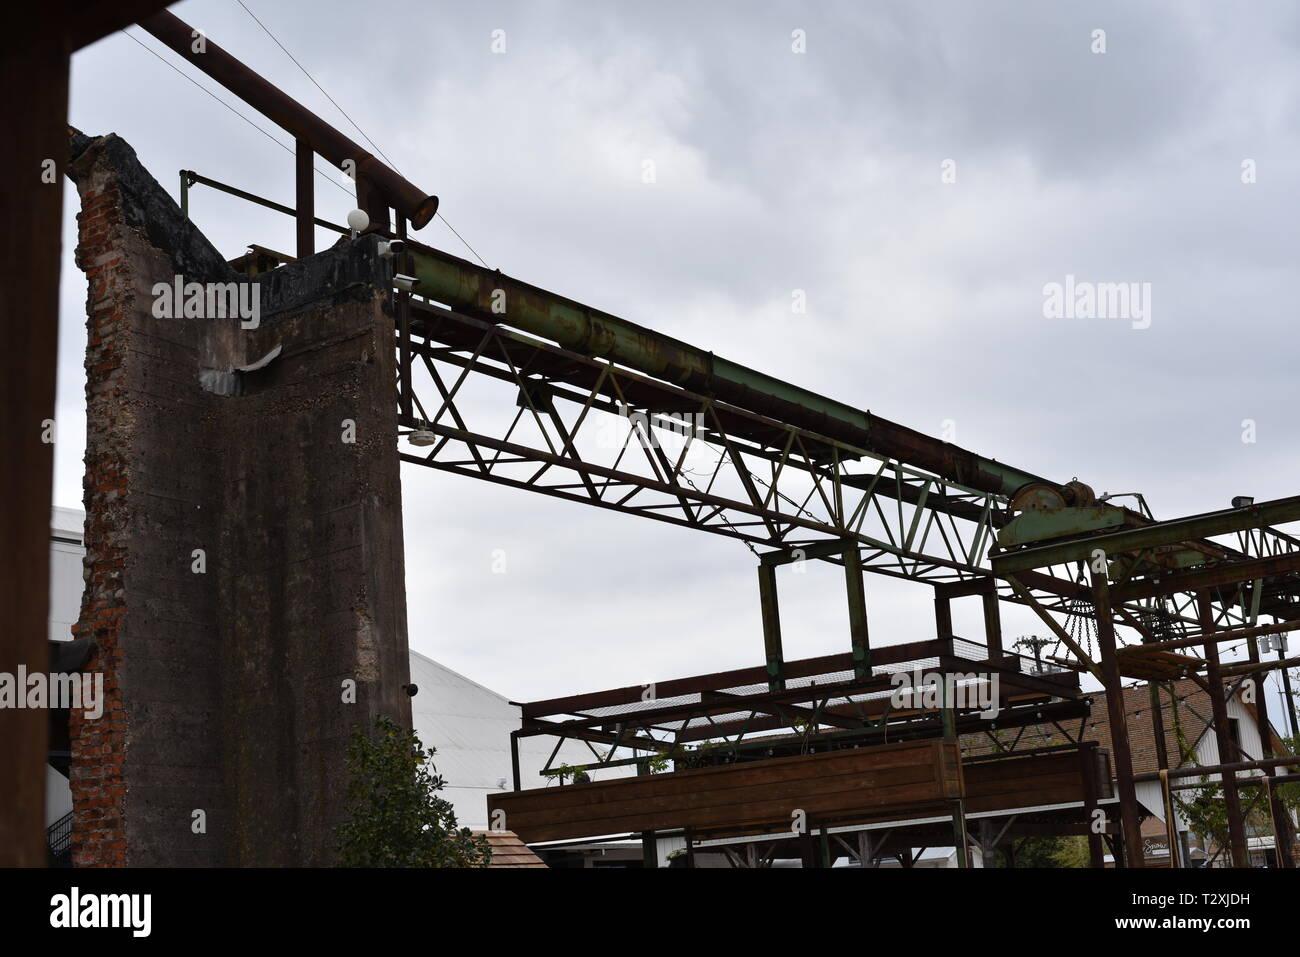 Grain Mill - Stock Image